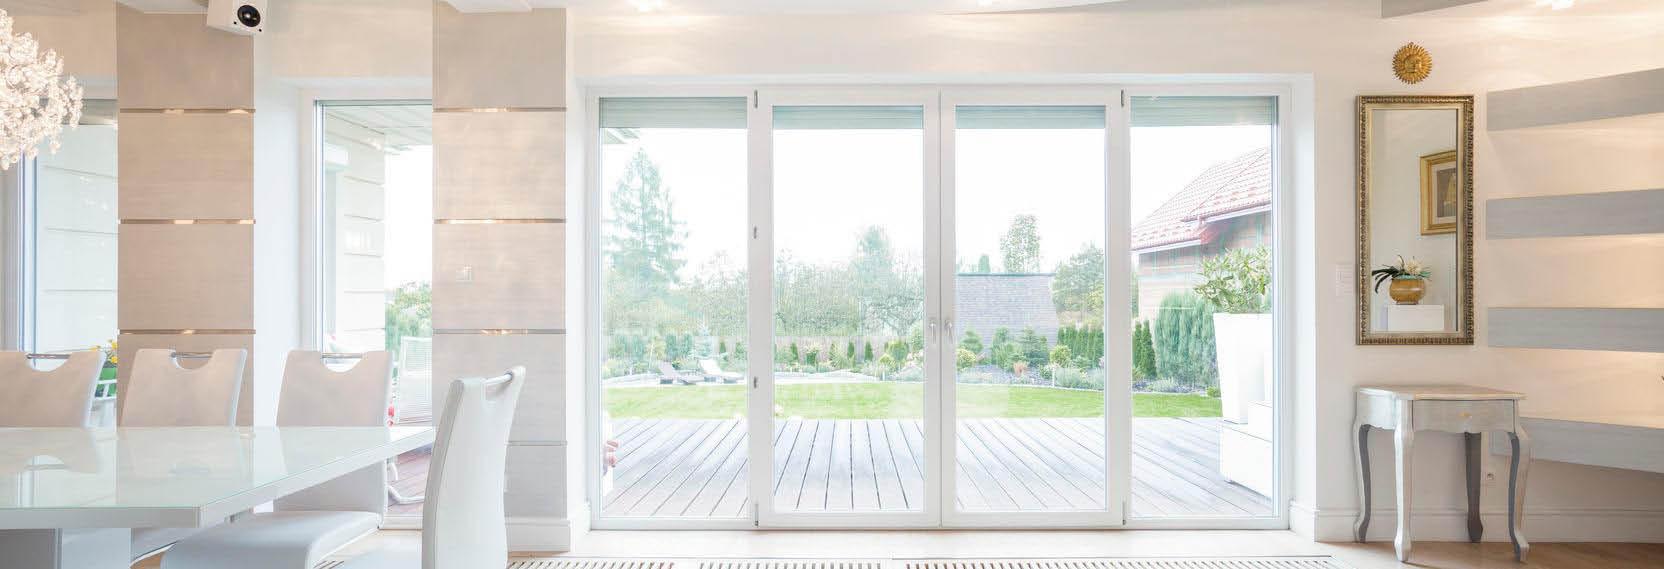 bowtie window cleaning window cleaners power washers dayton cincinnati ohio